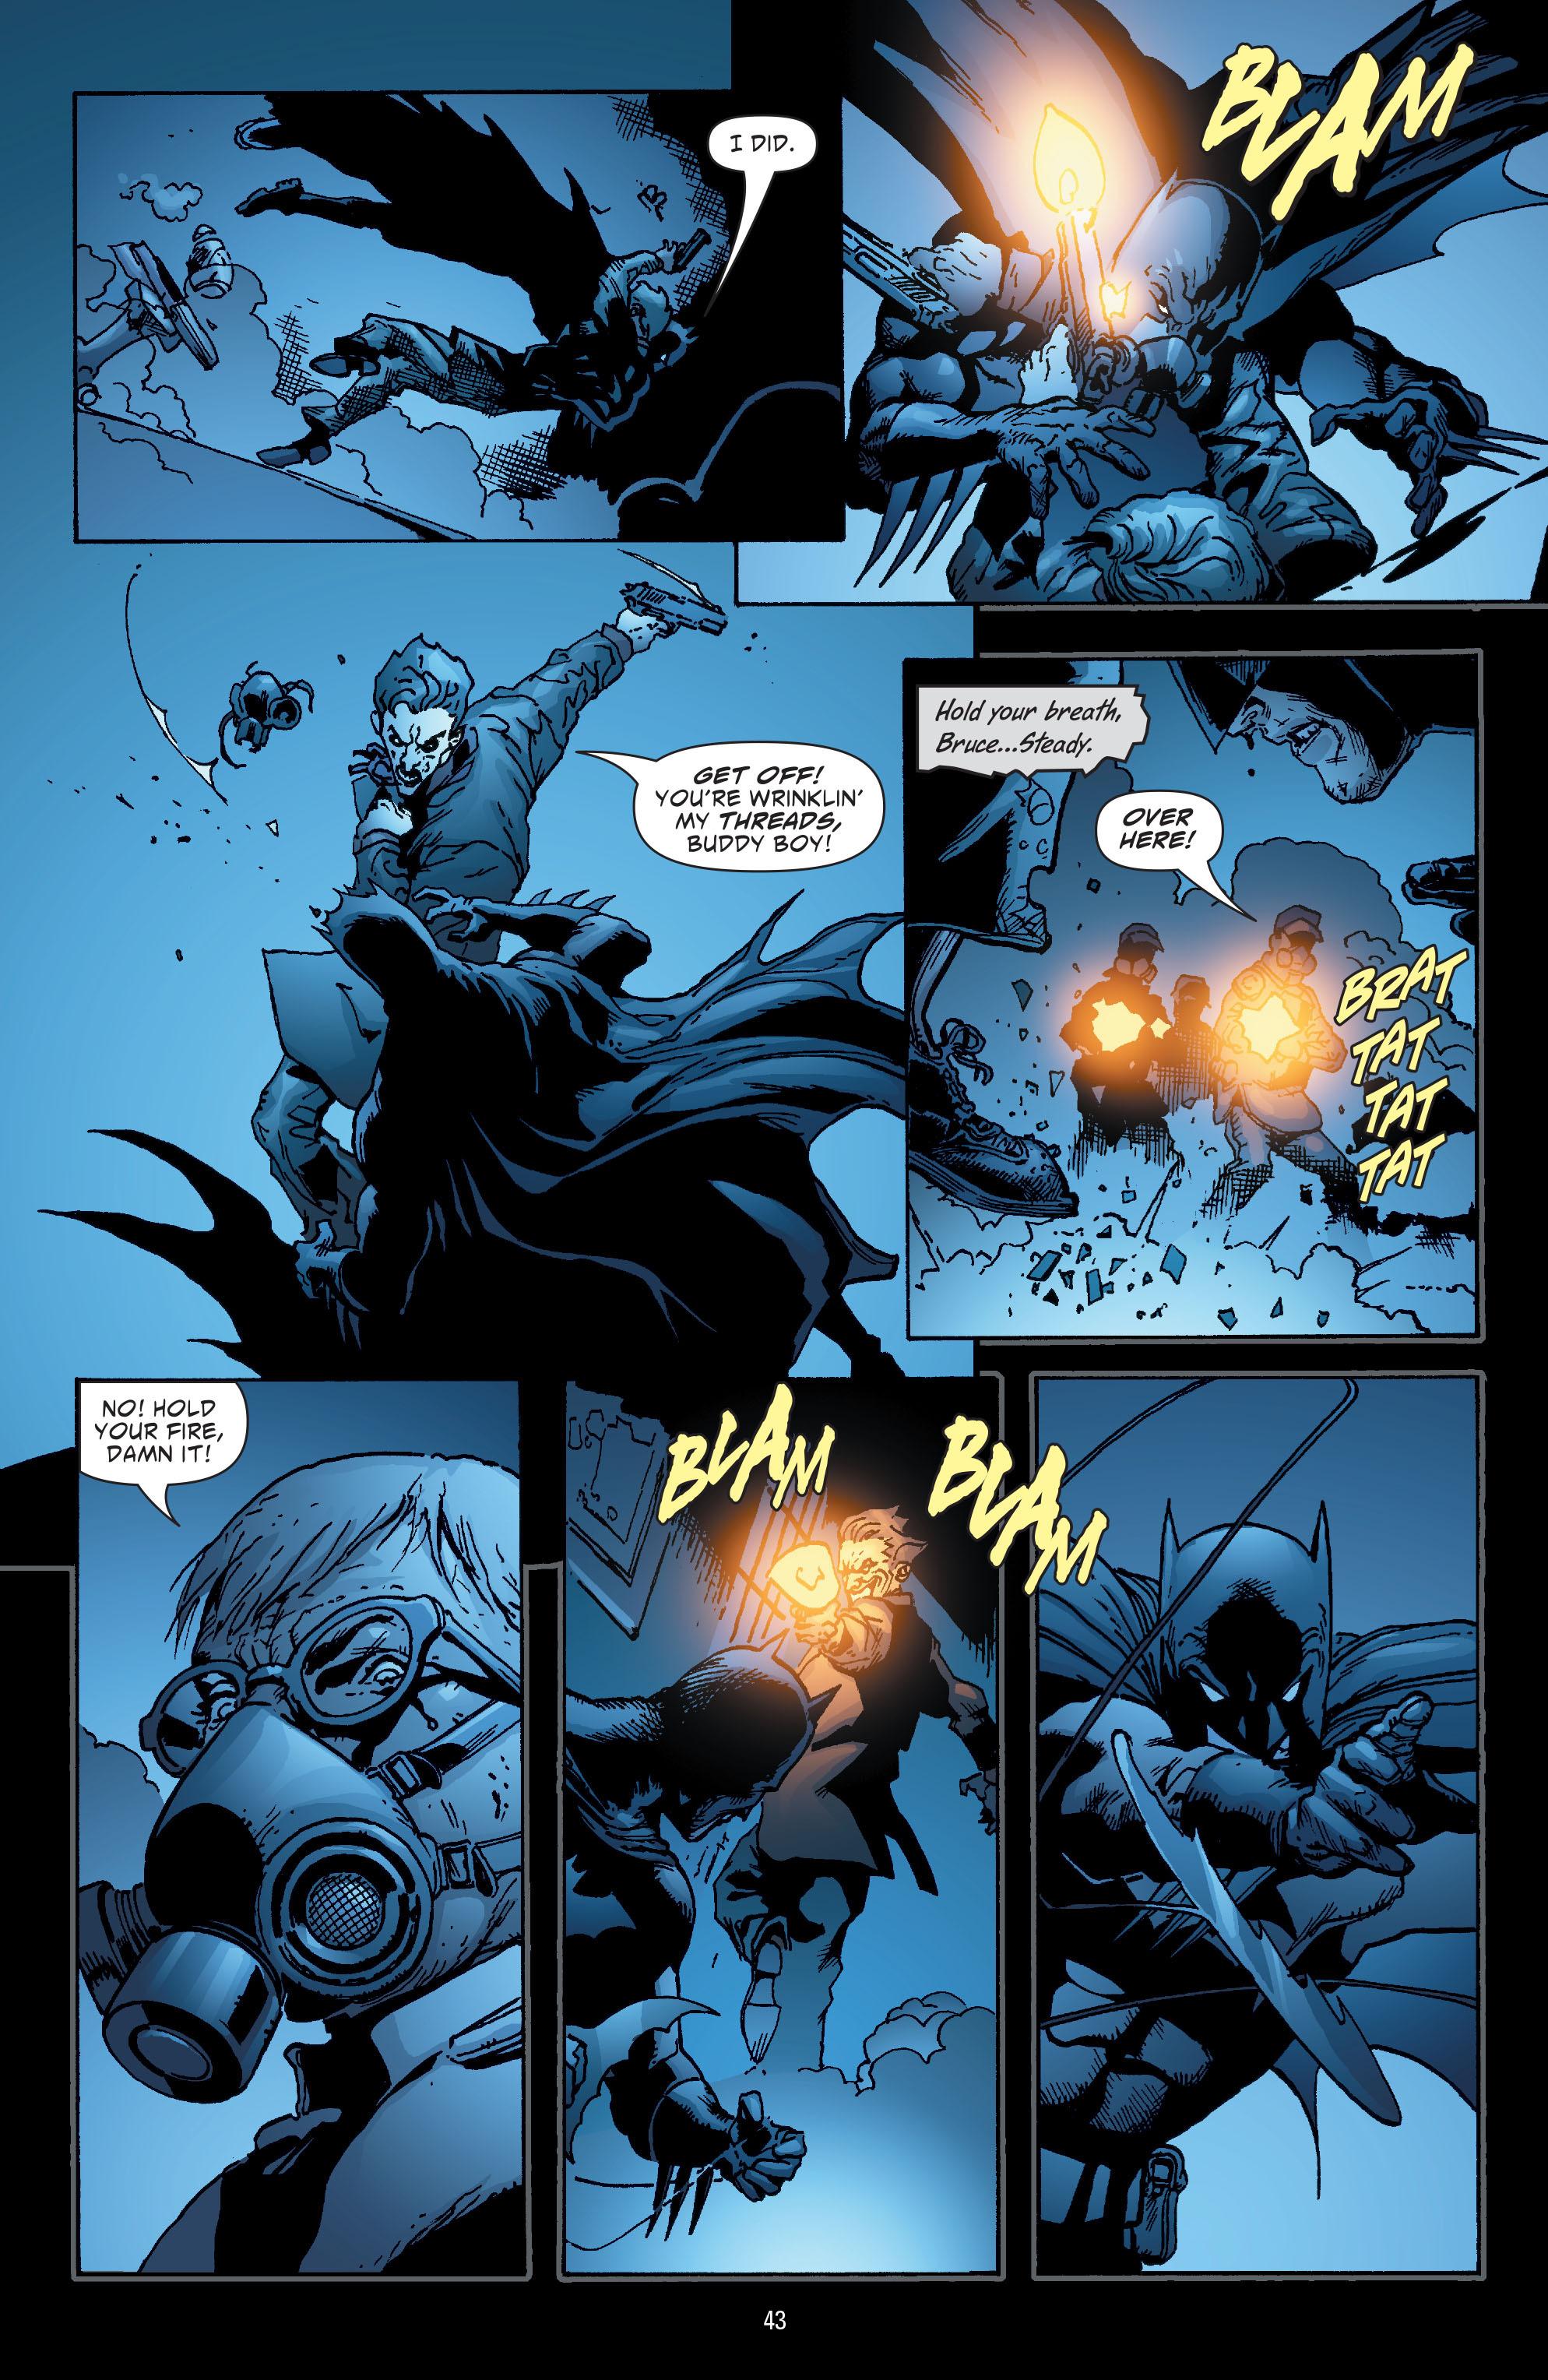 Batman: The Man Who Laughs chap 1 pic 44